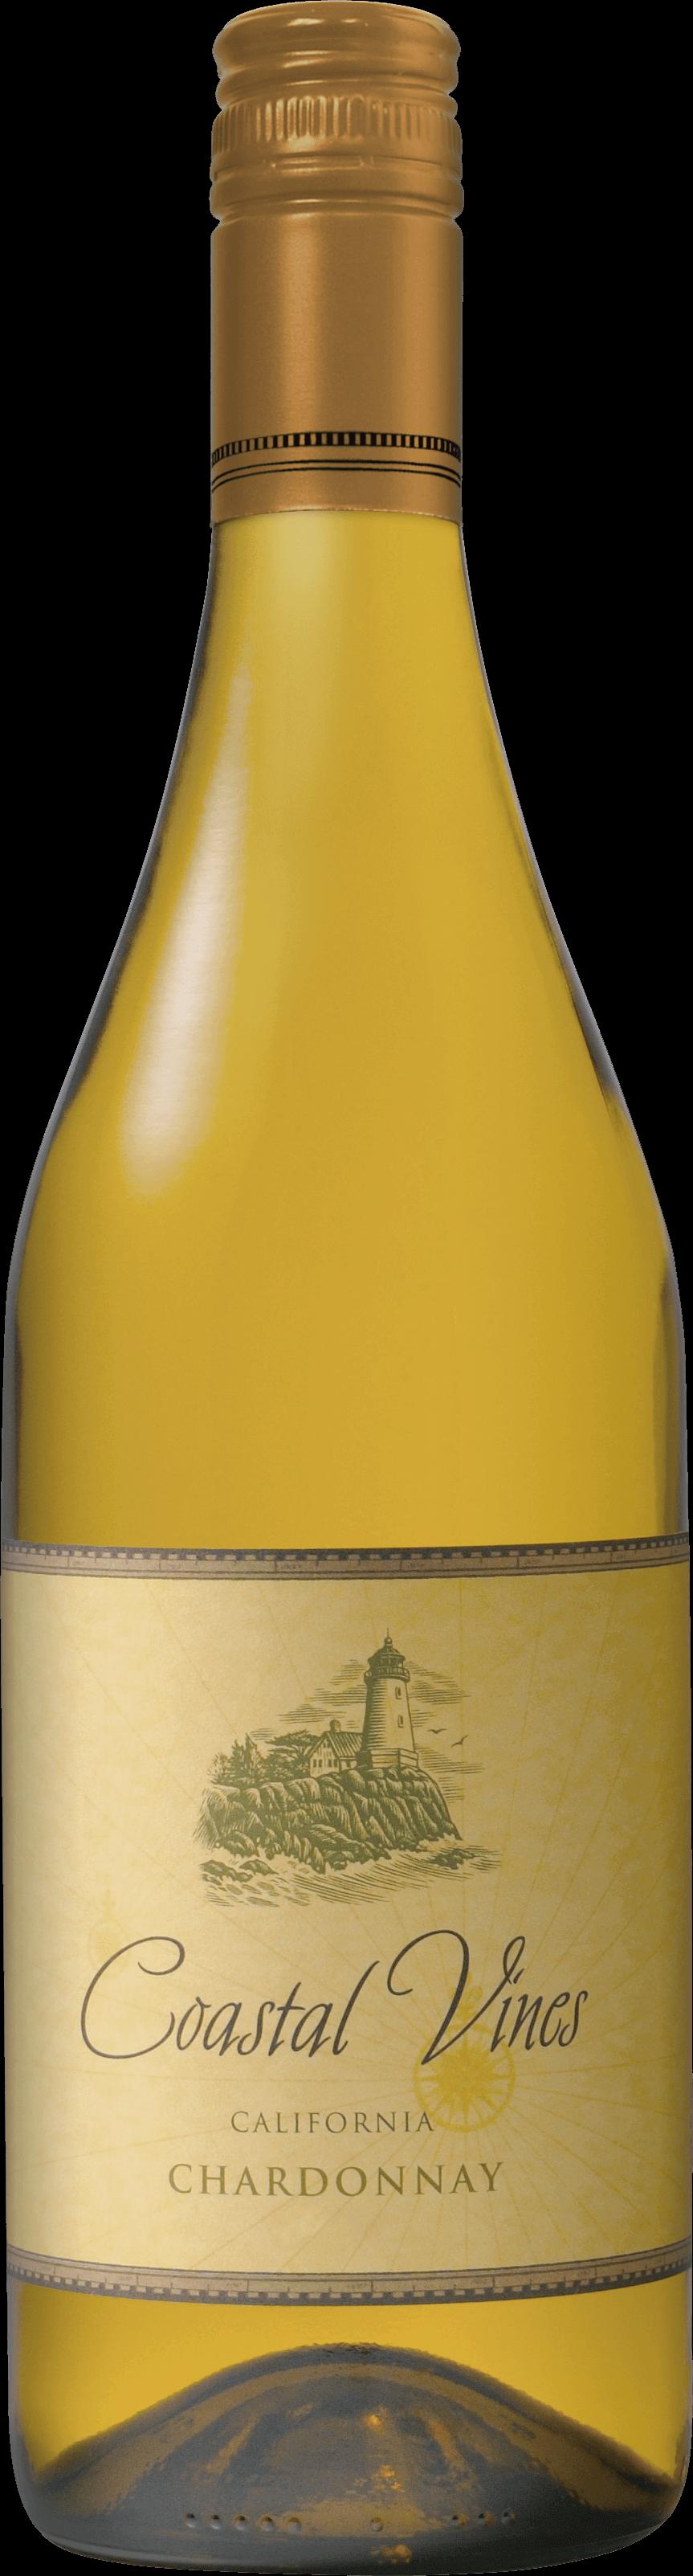 Coastal Vines Chardonnay Bottleshot